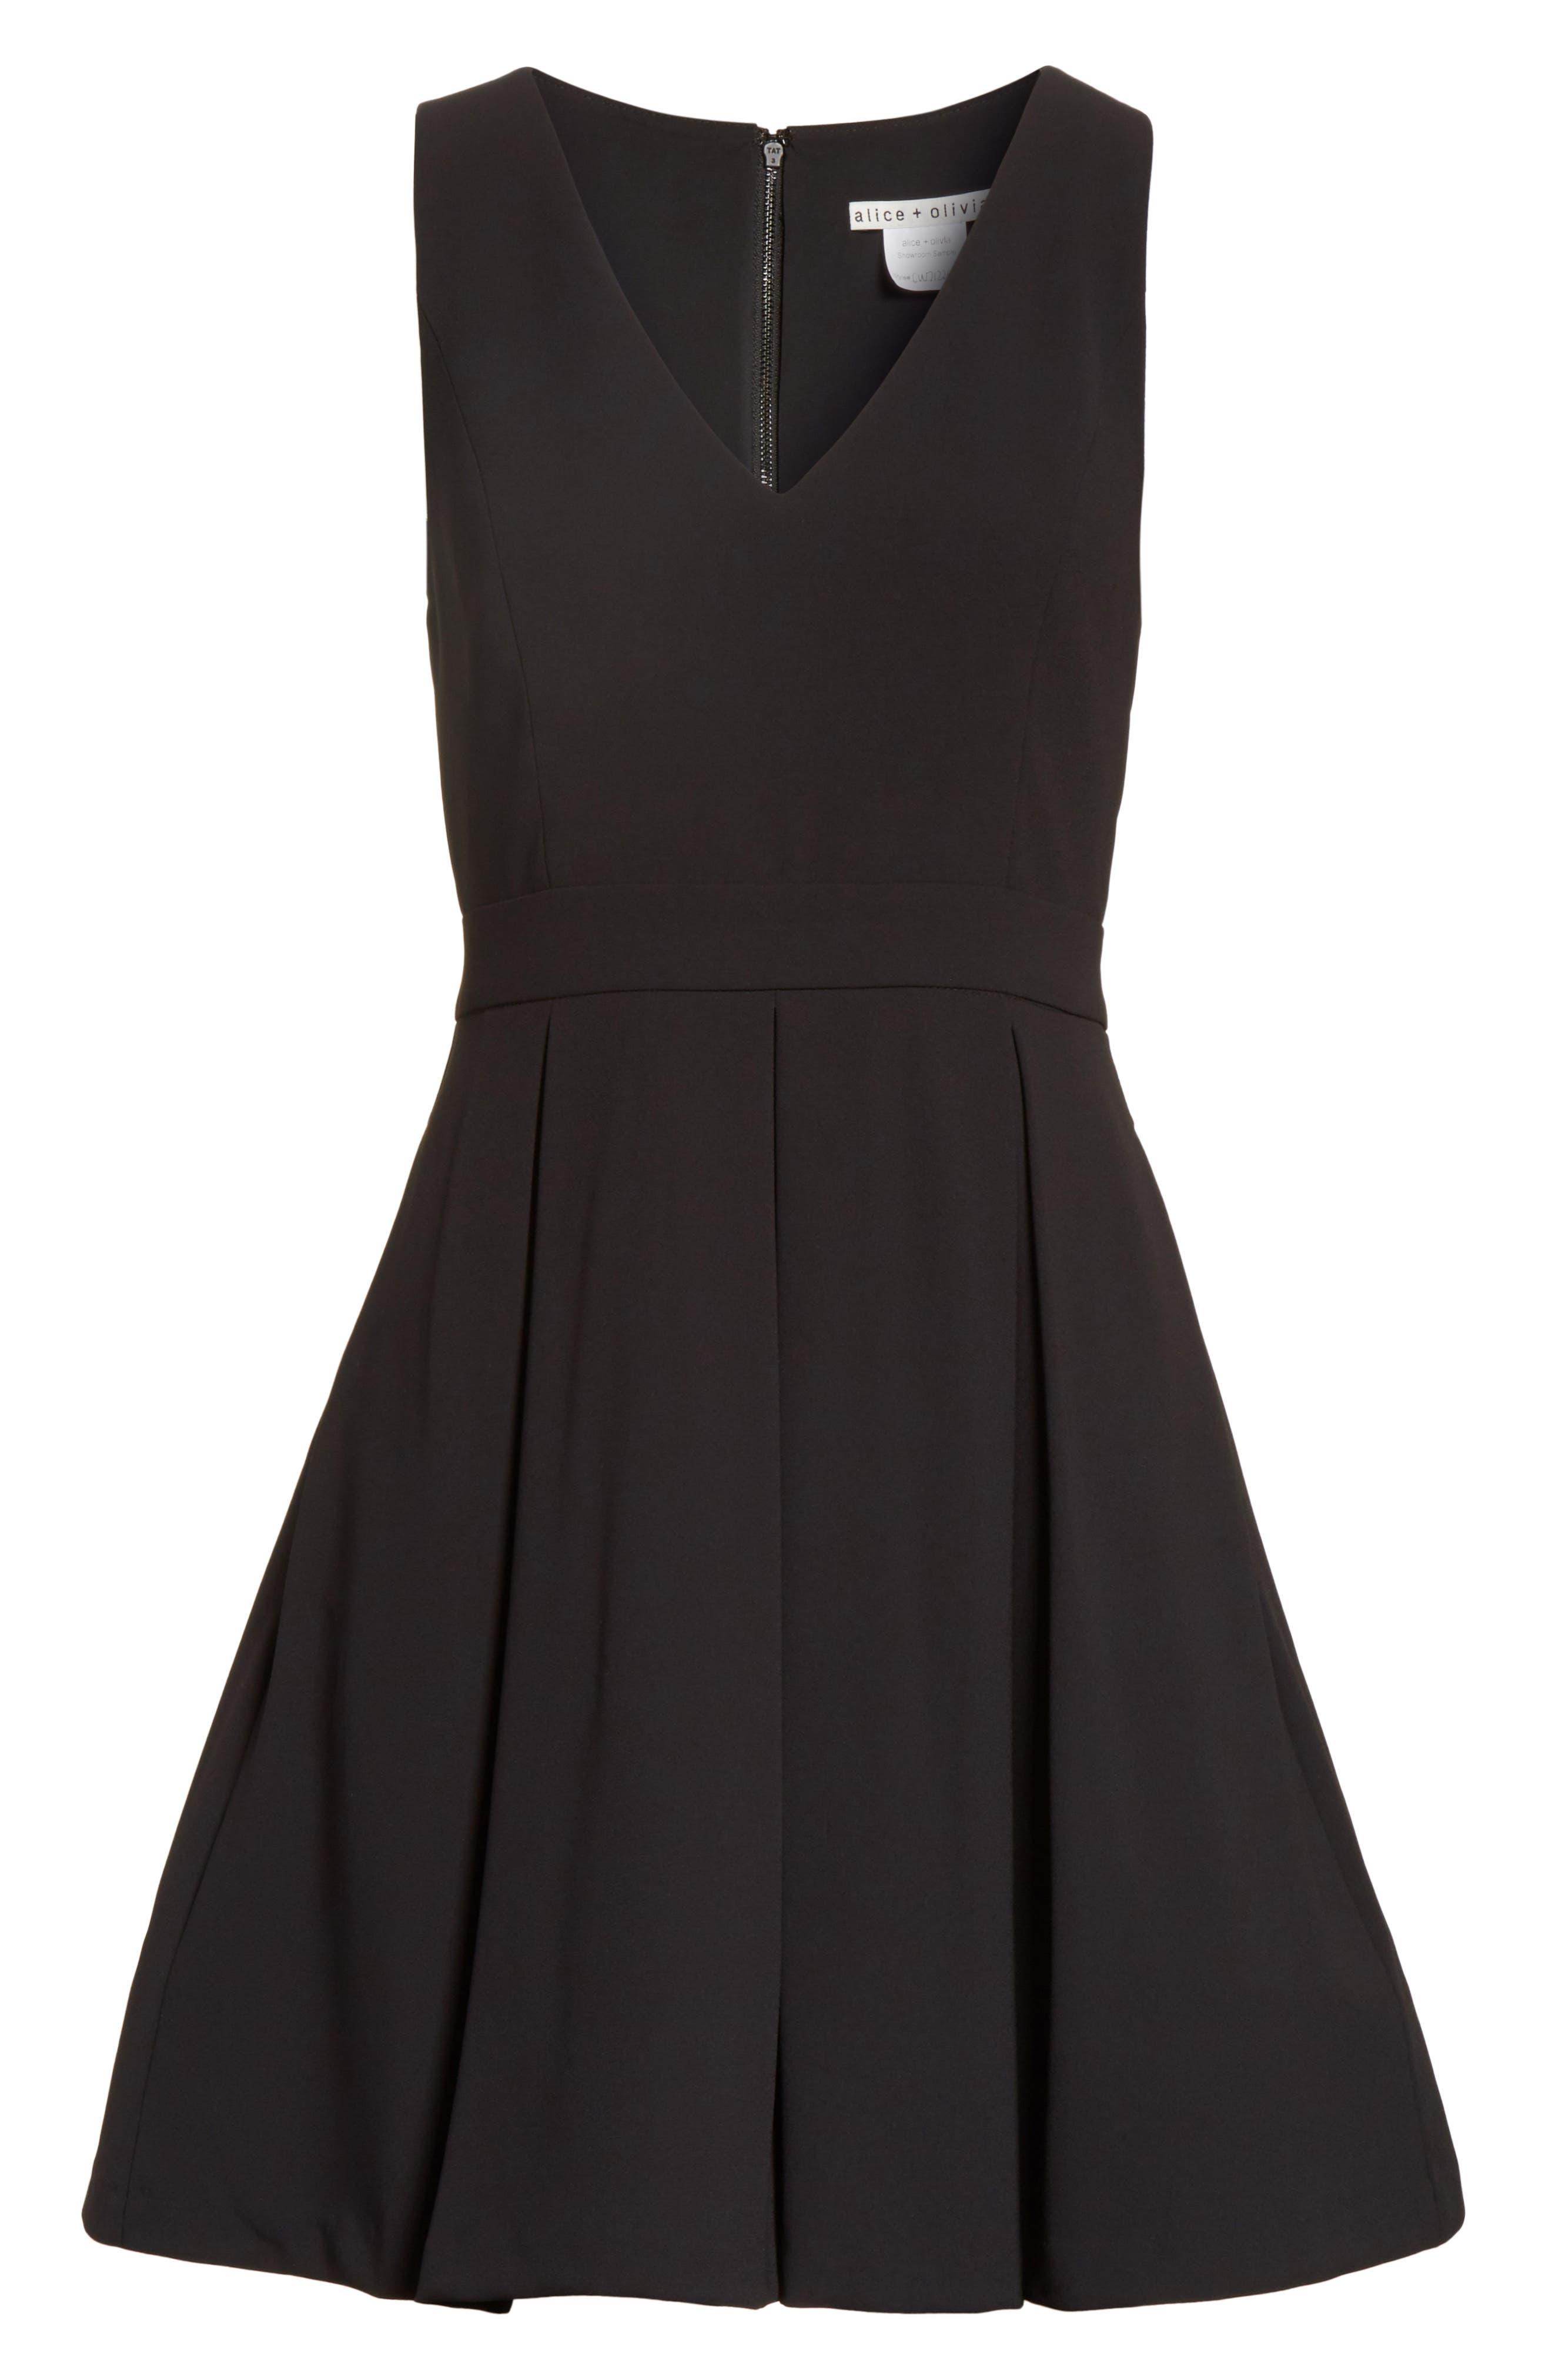 Julieta Inverted Pleat Fit & Flare Dress,                             Alternate thumbnail 6, color,